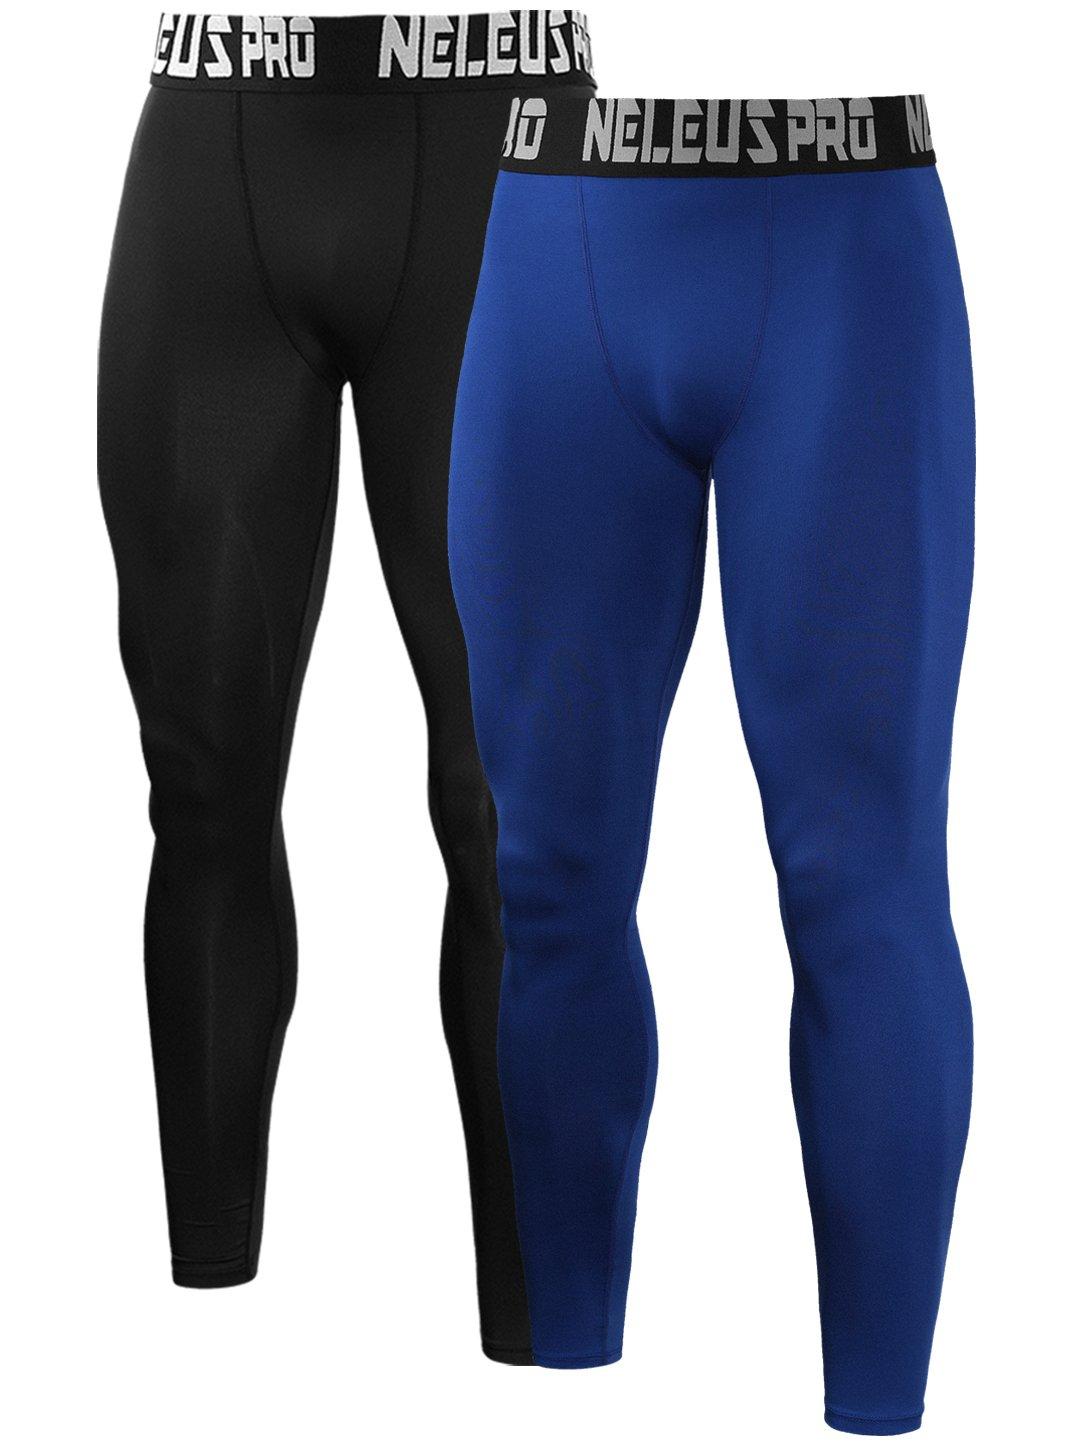 Neleus Men's 2 Pack Compression Tights Sport Running Leggings Pants,6019,Black,Blue,US S,EU M